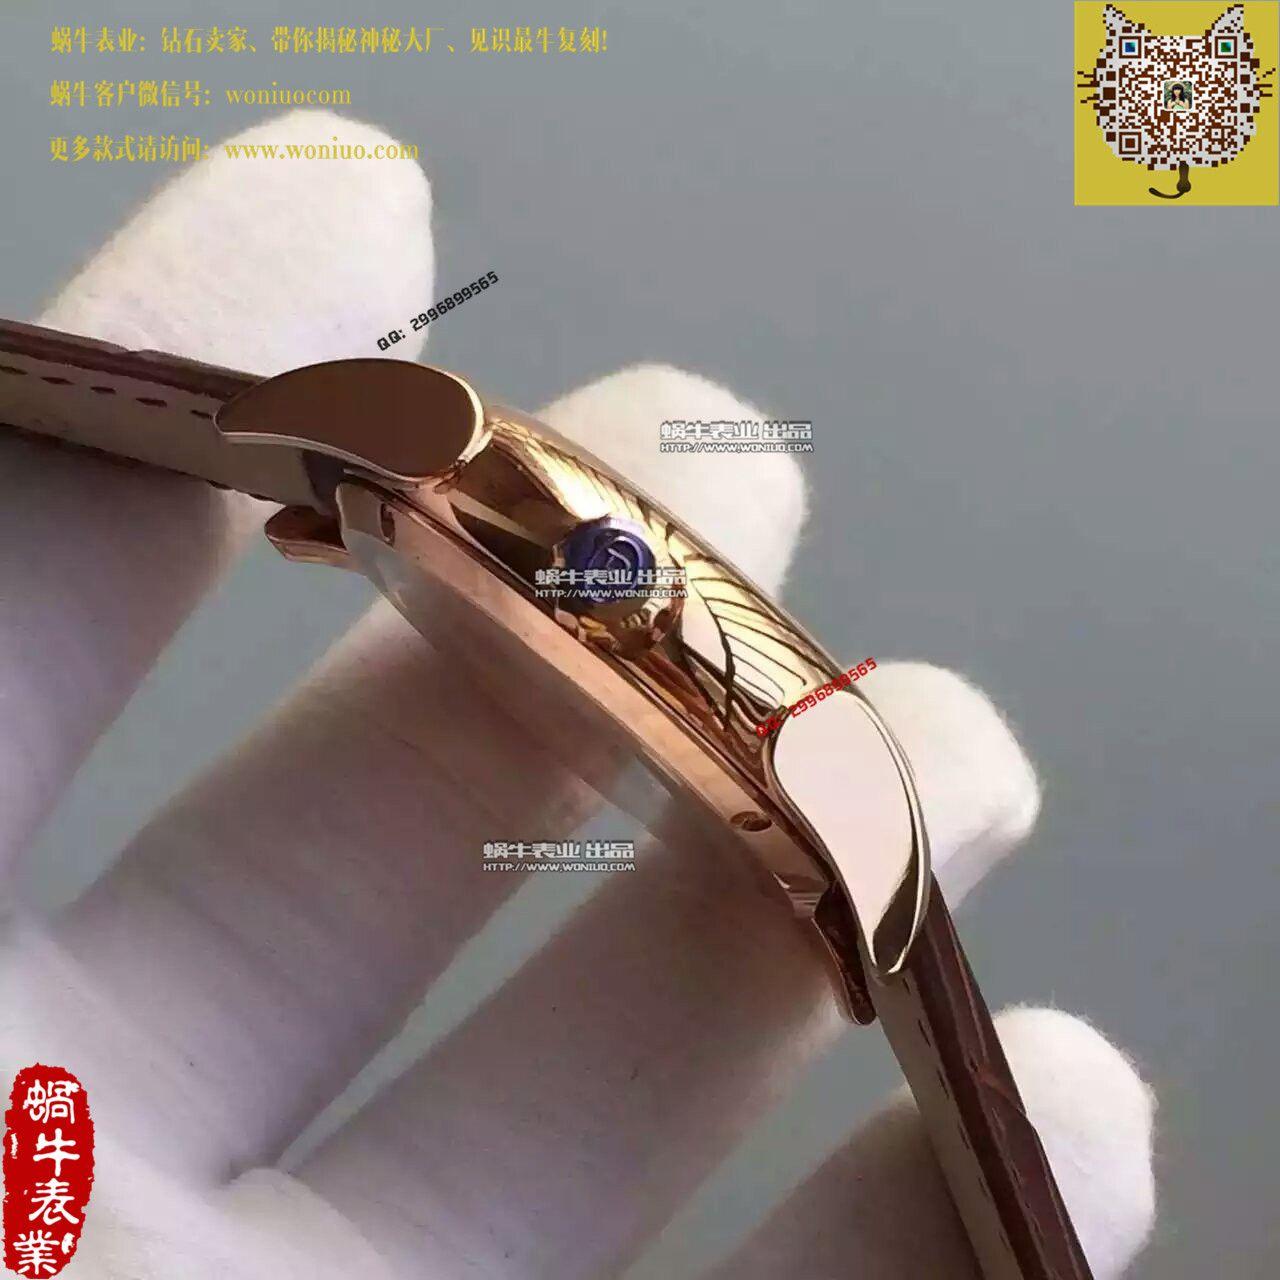 【TF厂一比一复刻手表】帕玛强尼Tonda系列PF012500.01 表经42mm腕表 / PM024